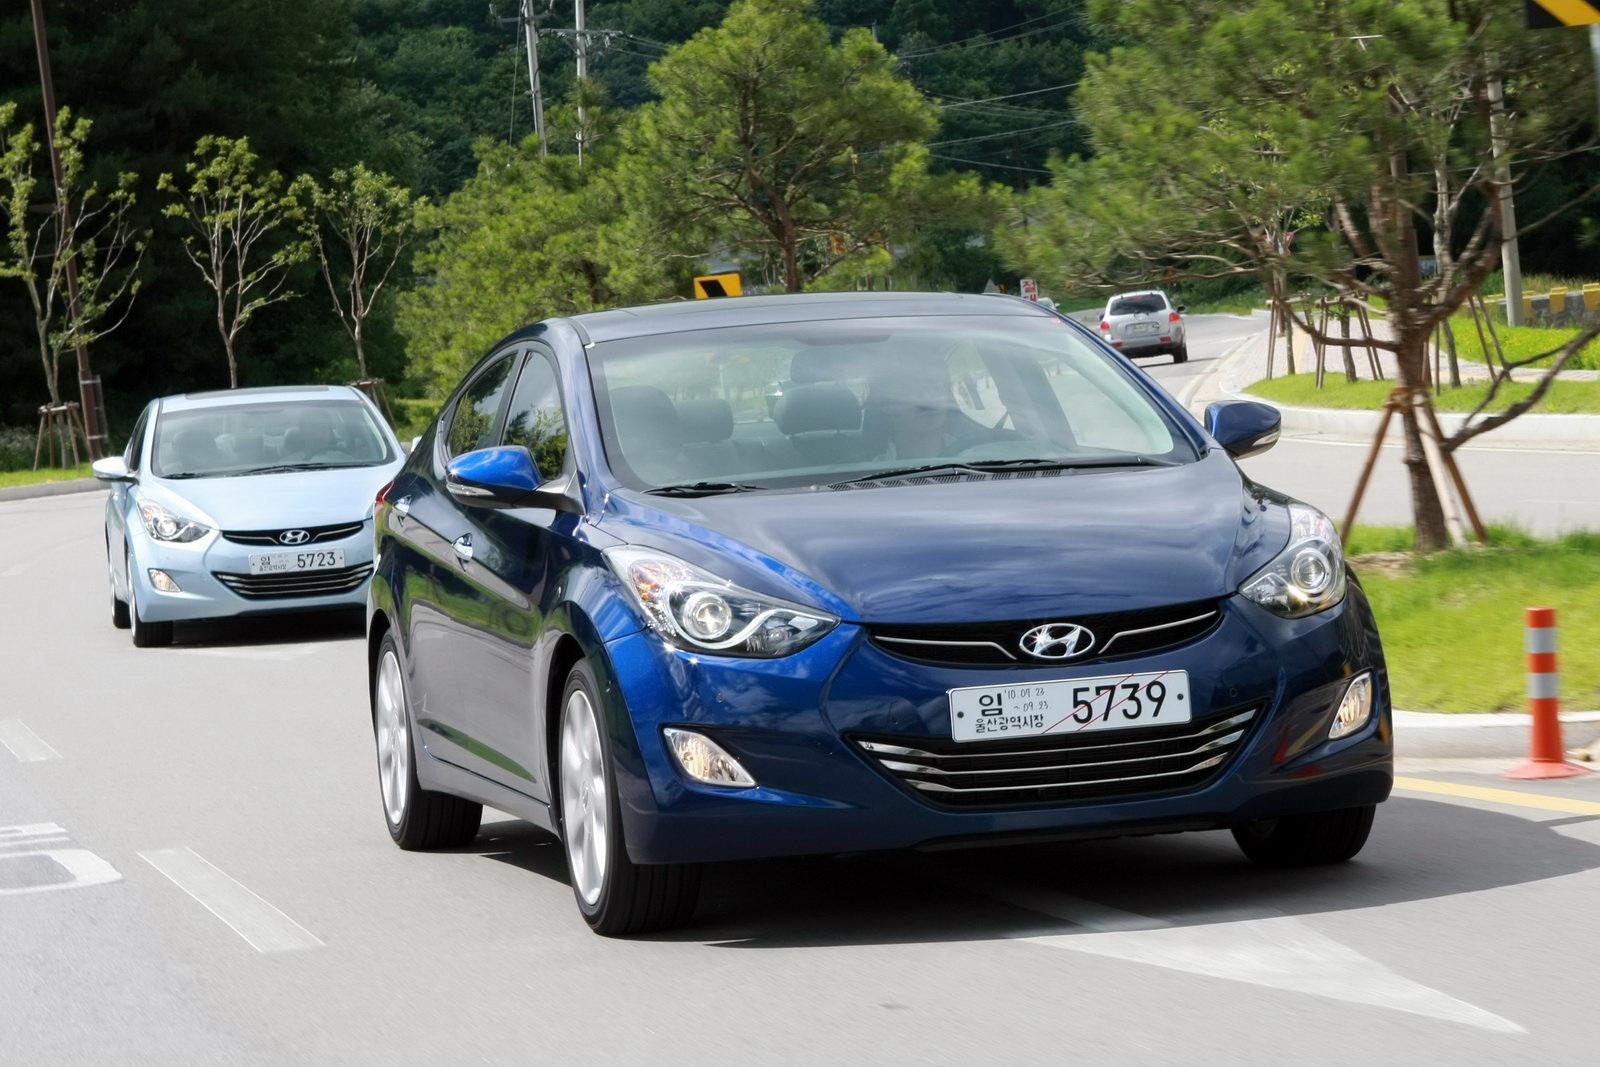 2011 Hyundai Elantra Real Life Photos Autoevolution